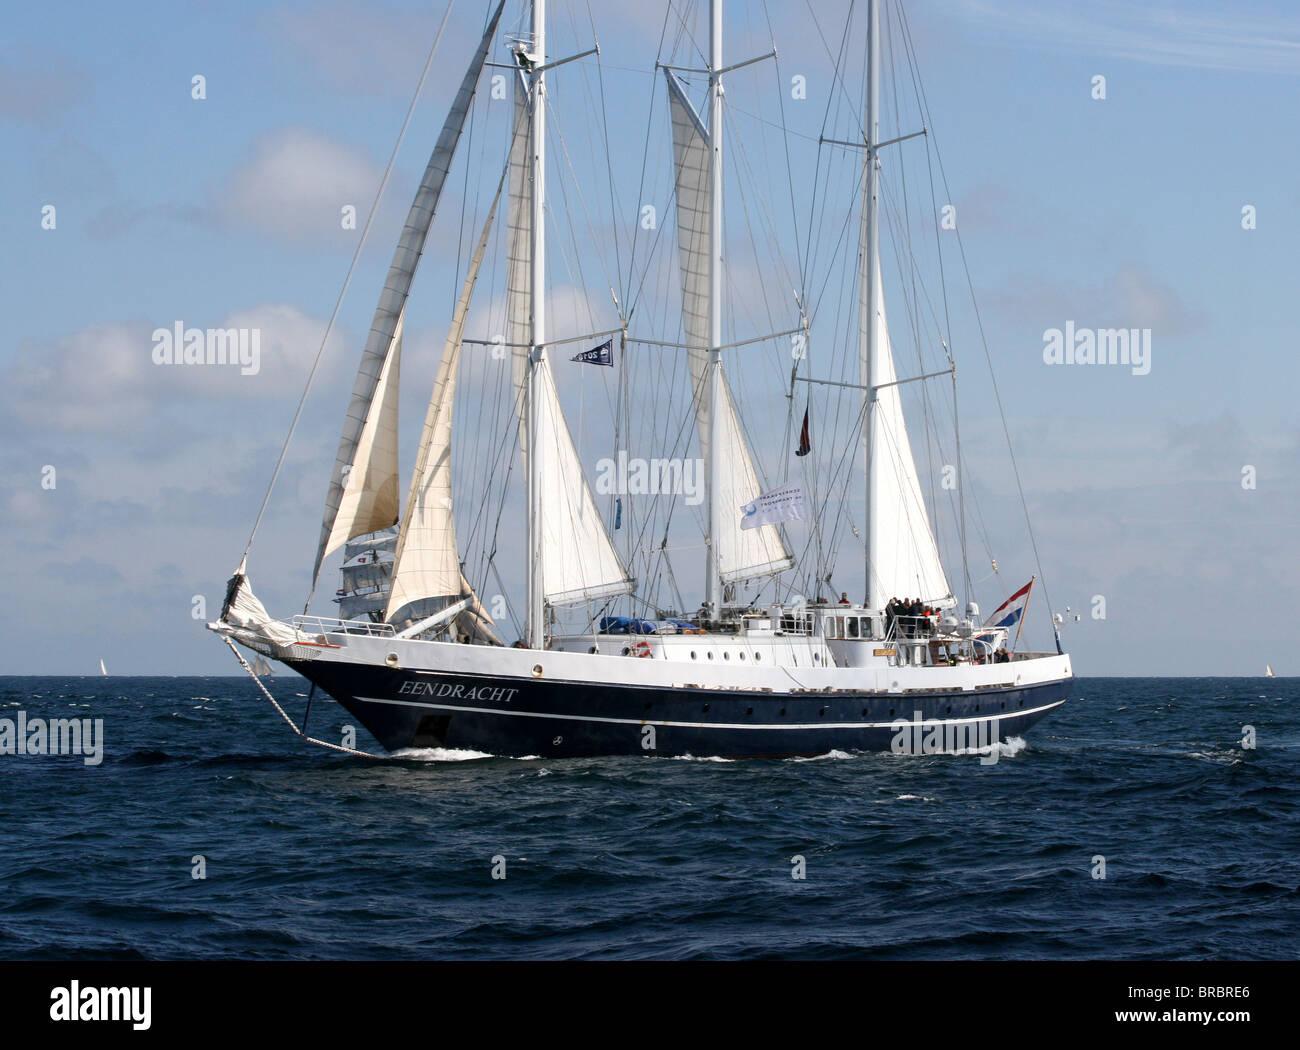 Eendracht, The Tall Ships Races 2010, Kristiansand - Stock Image